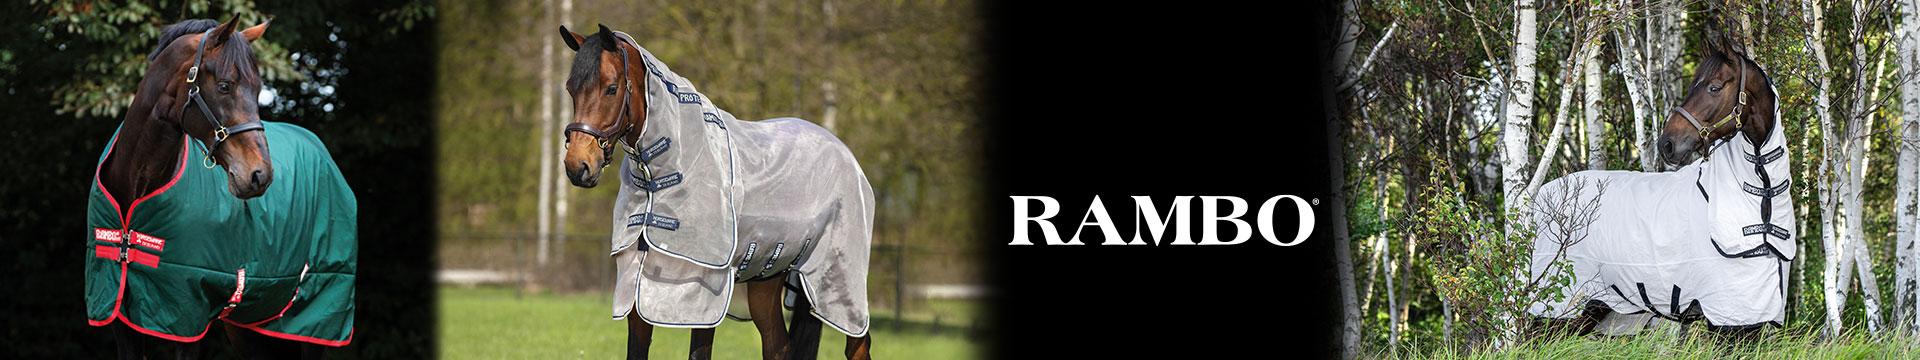 Horseware Rambo